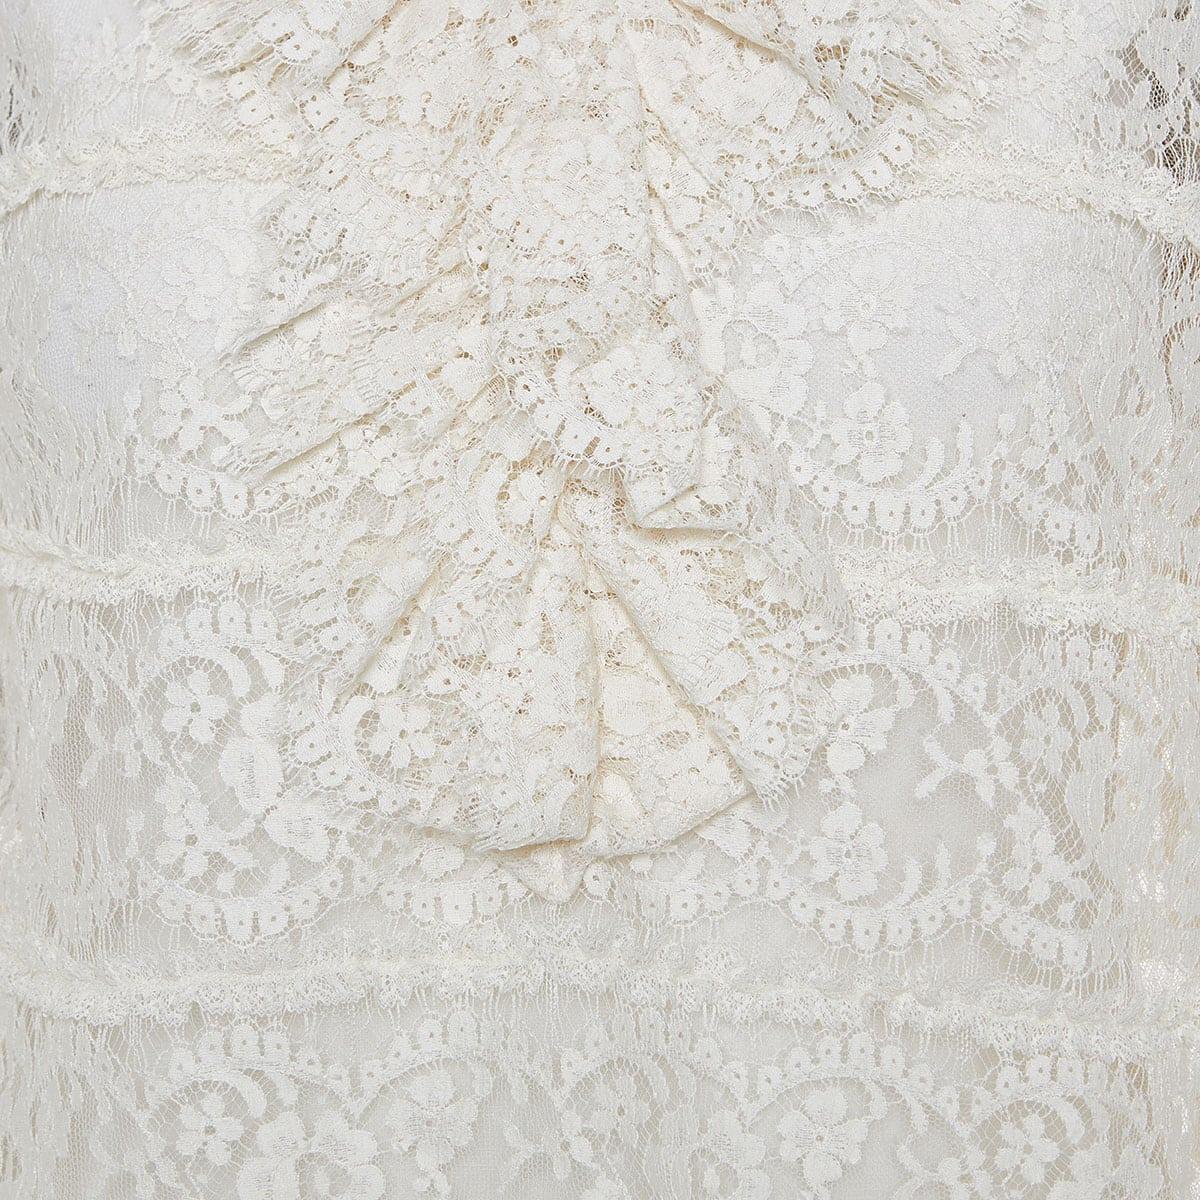 Ruffled sheer lace blouse